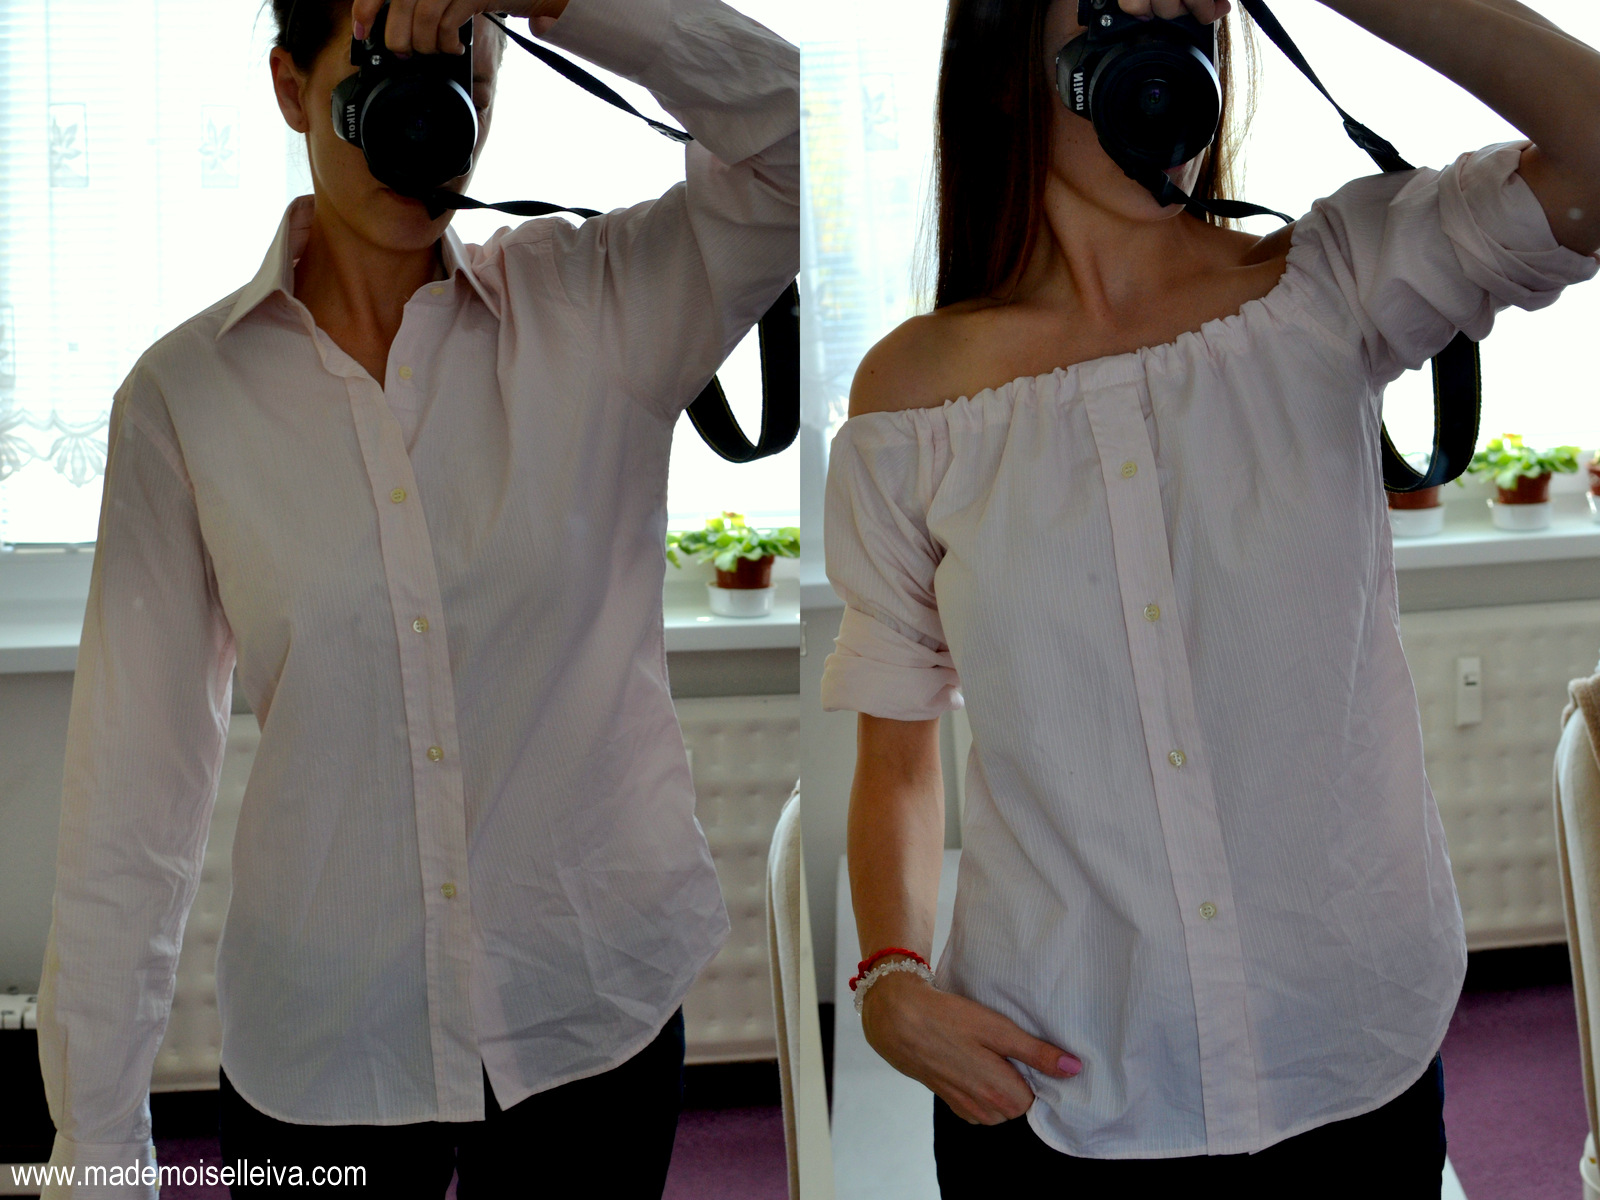 refashion: men's shirt to off the shoulder blouse